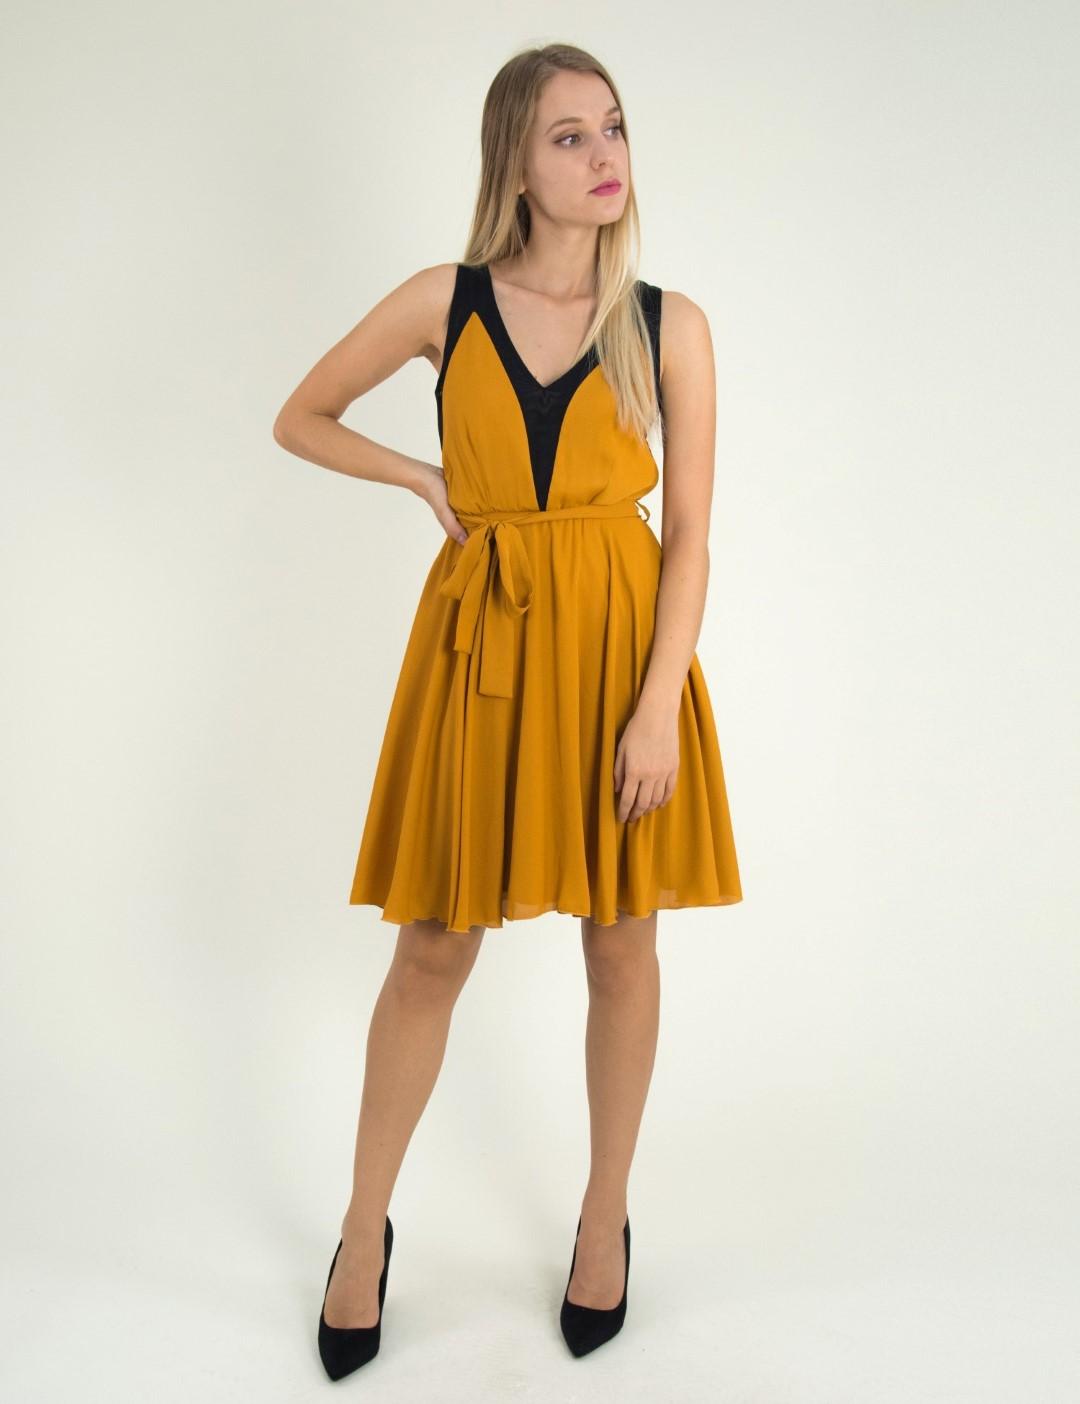 aa06e2ab43 Γυναικείο ώχρα αμάνικο φόρεμα κλος τούλι 8317229G